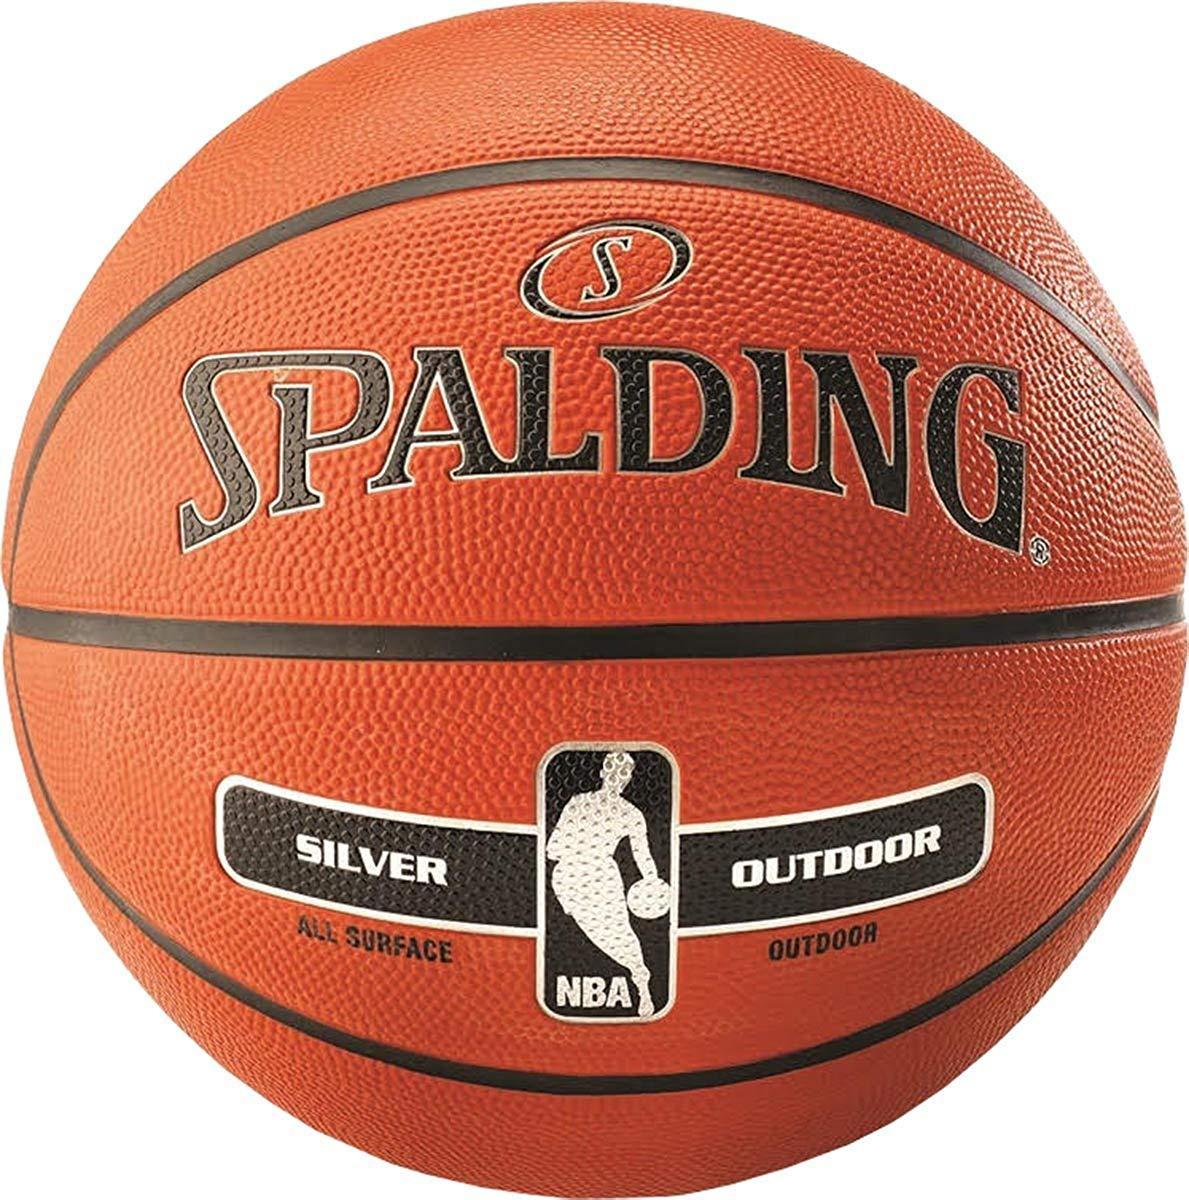 Мяч баскетбольный Spalding Nba Silver Outdoor Size 7 M41-238017